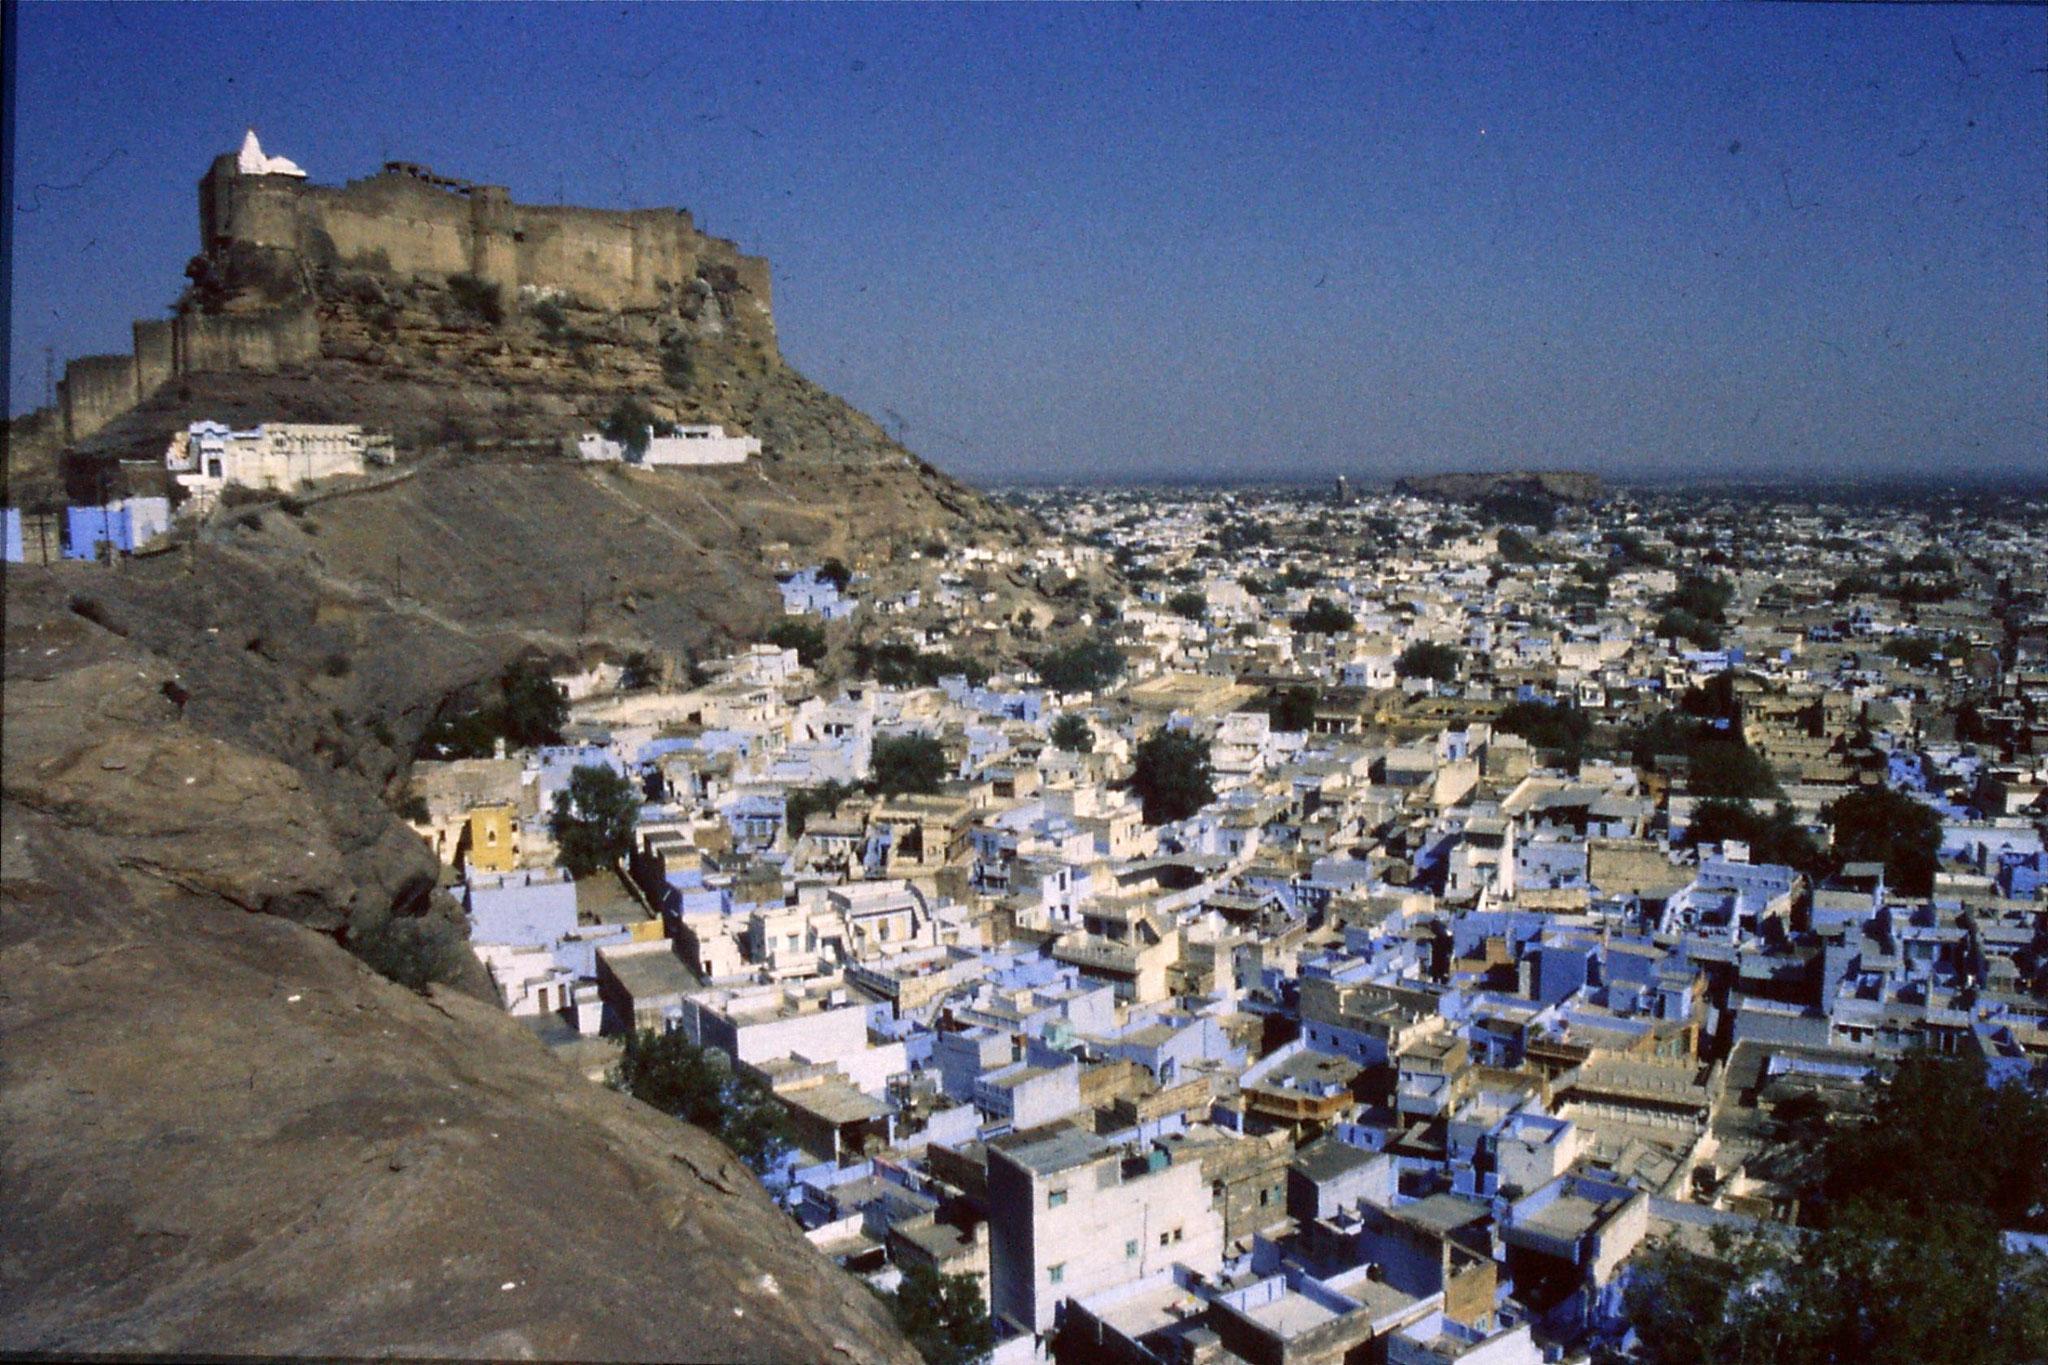 29/11/1989: 12: Jodhpur view from Rock